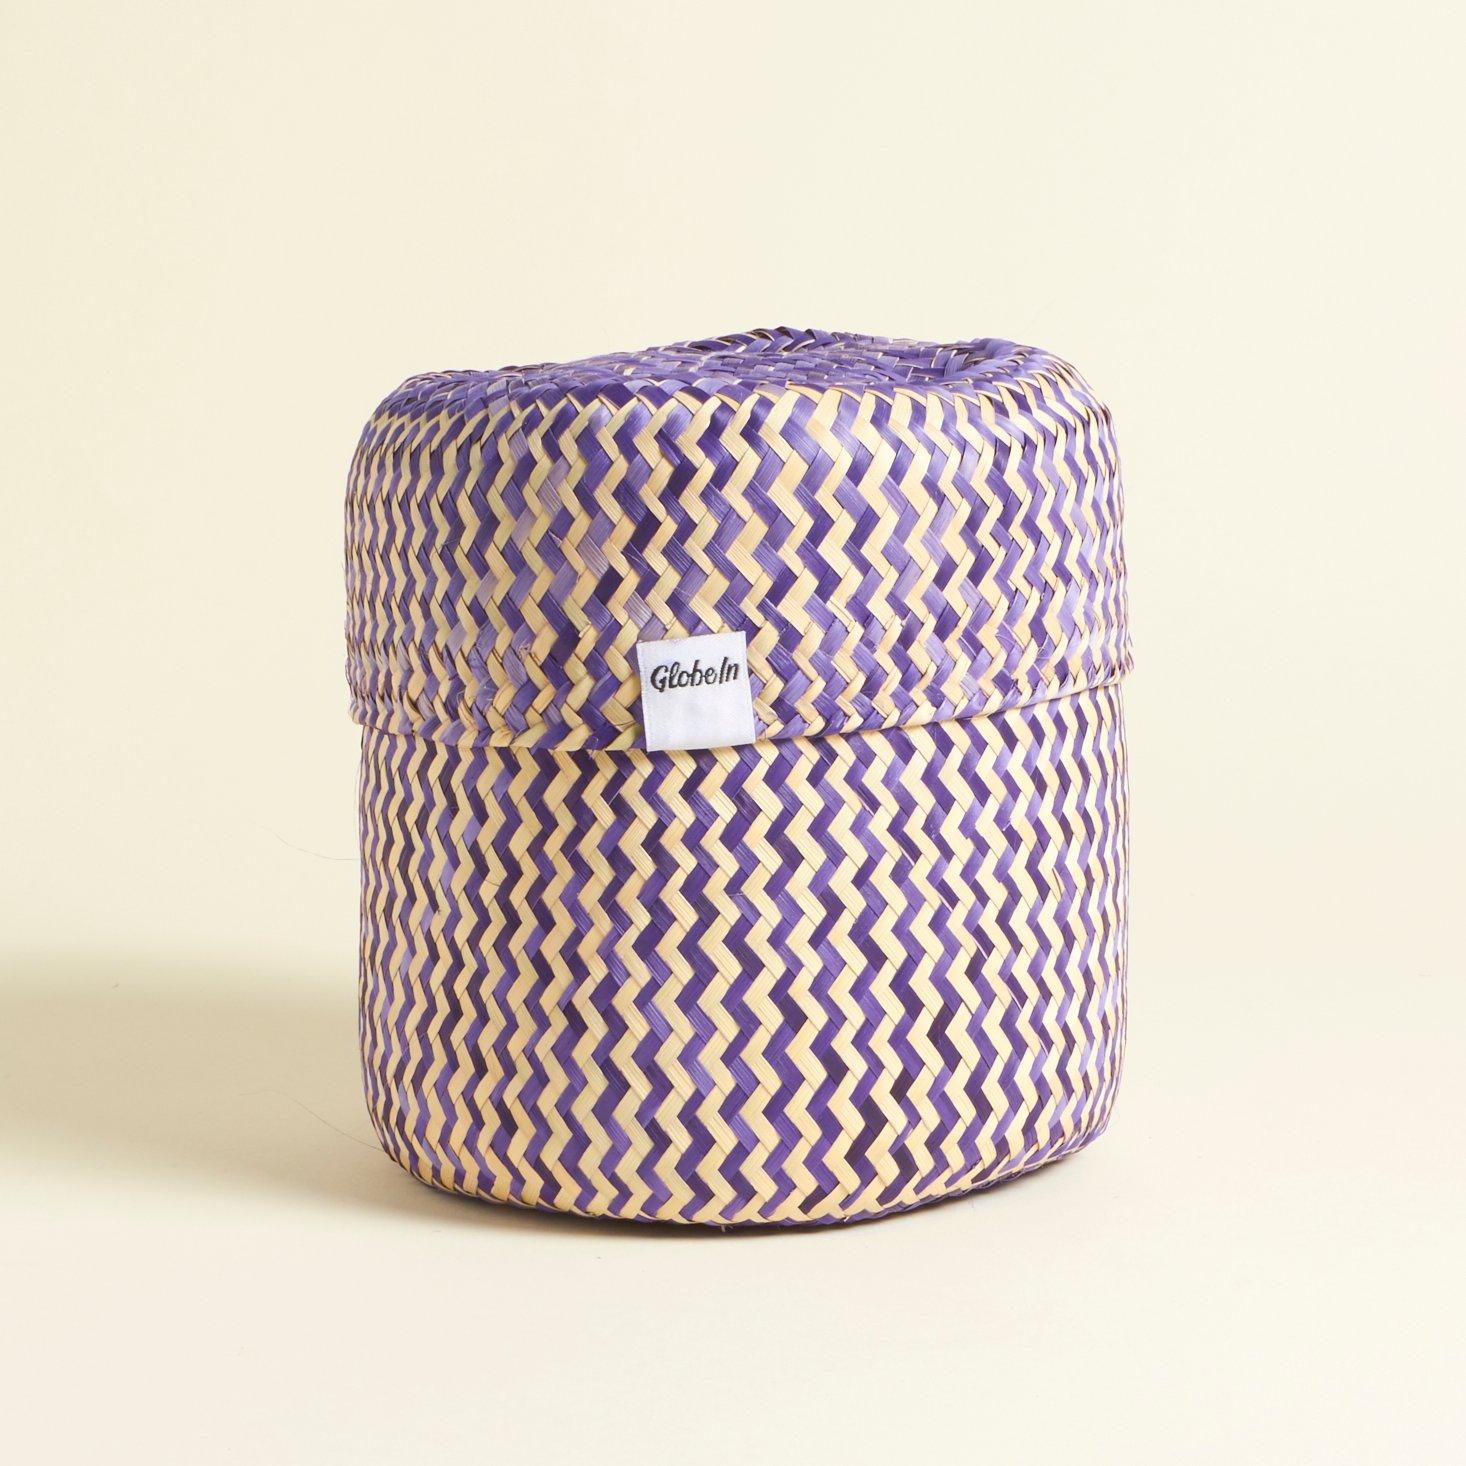 globein-artisan-box-december-2016-0018